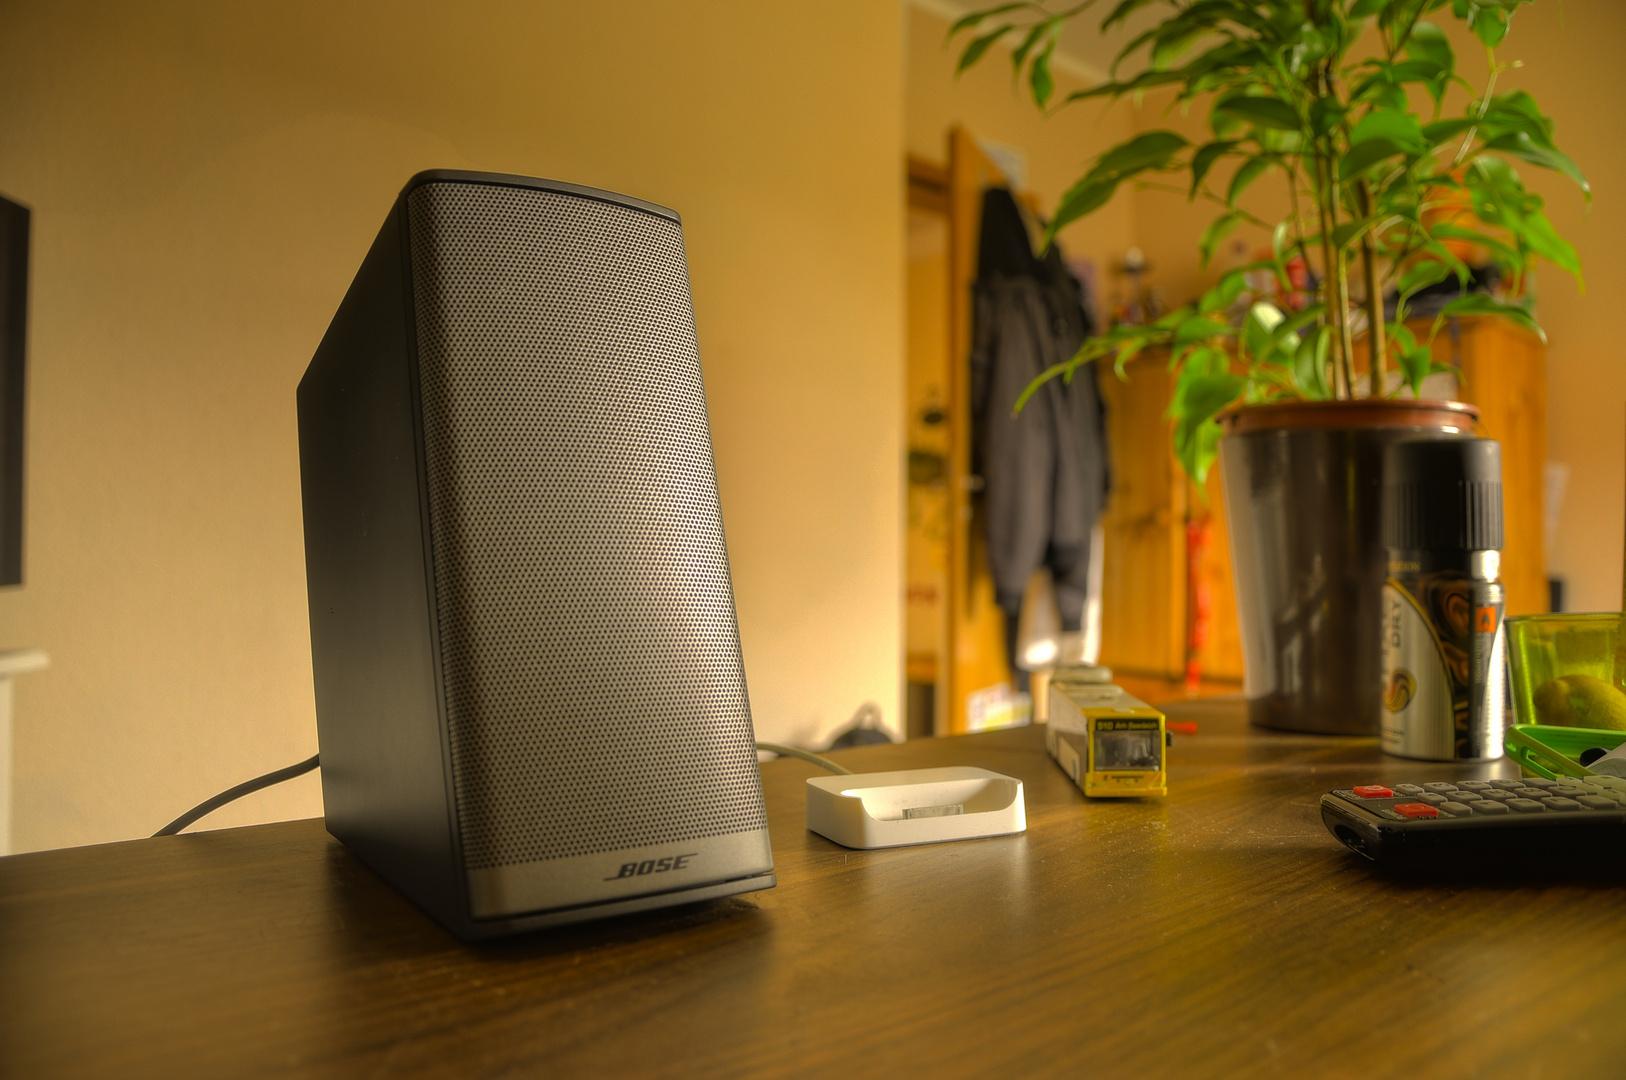 Bose Box als HDR